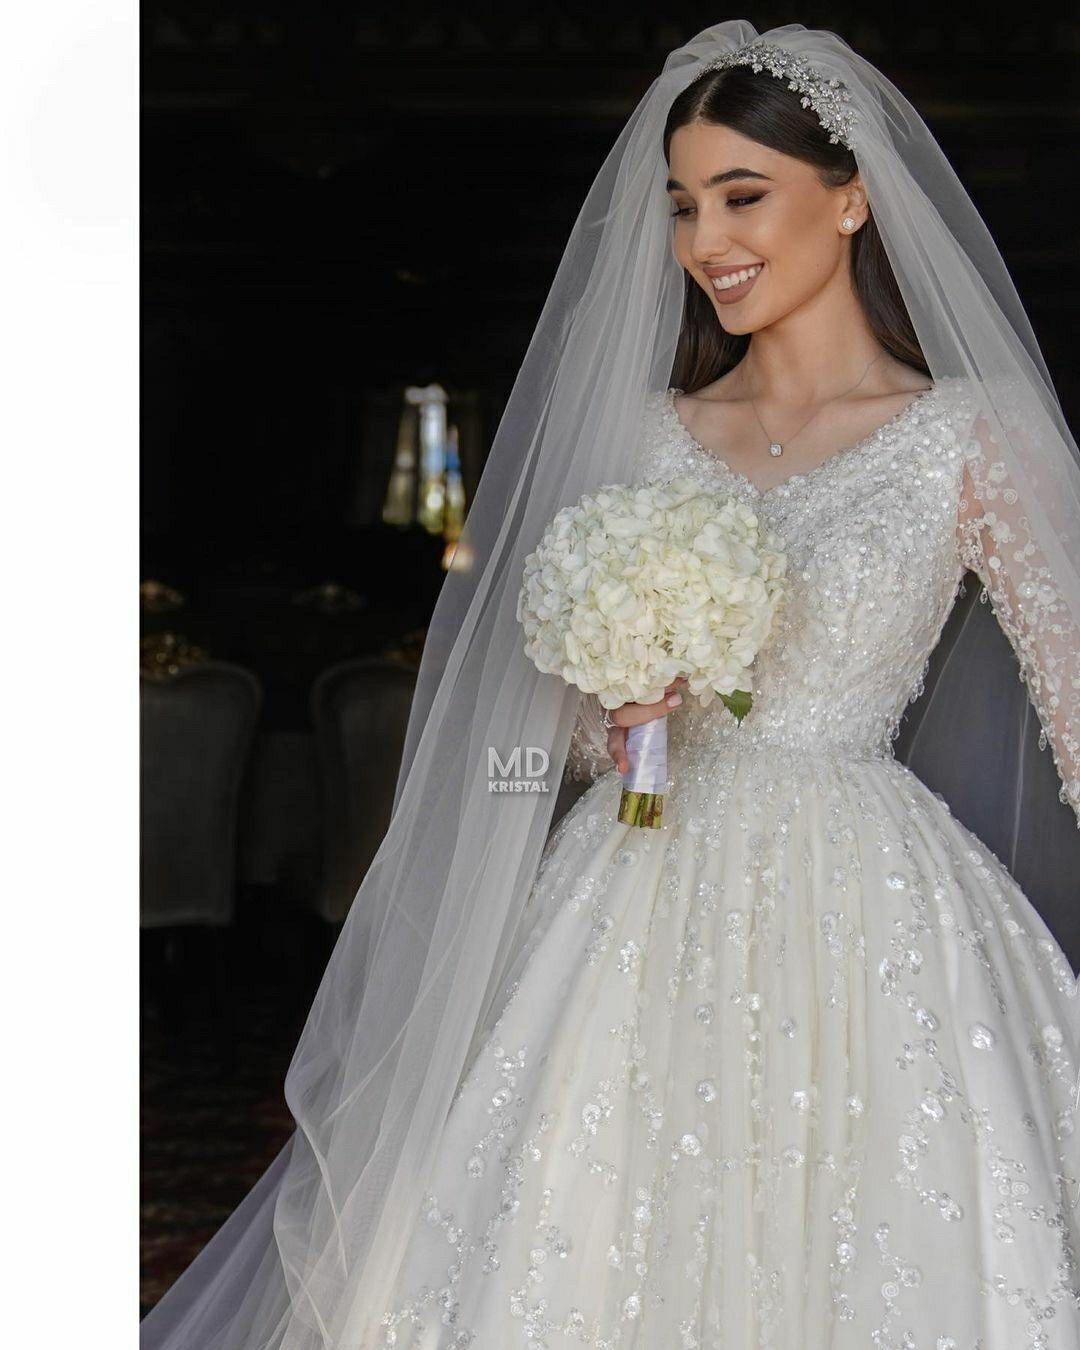 Bride Sparkly White Wedding Dress And Veil Wedding Dresses Turkish Wedding Dress Wedding Dresses Vintage Princess [ 1350 x 1080 Pixel ]